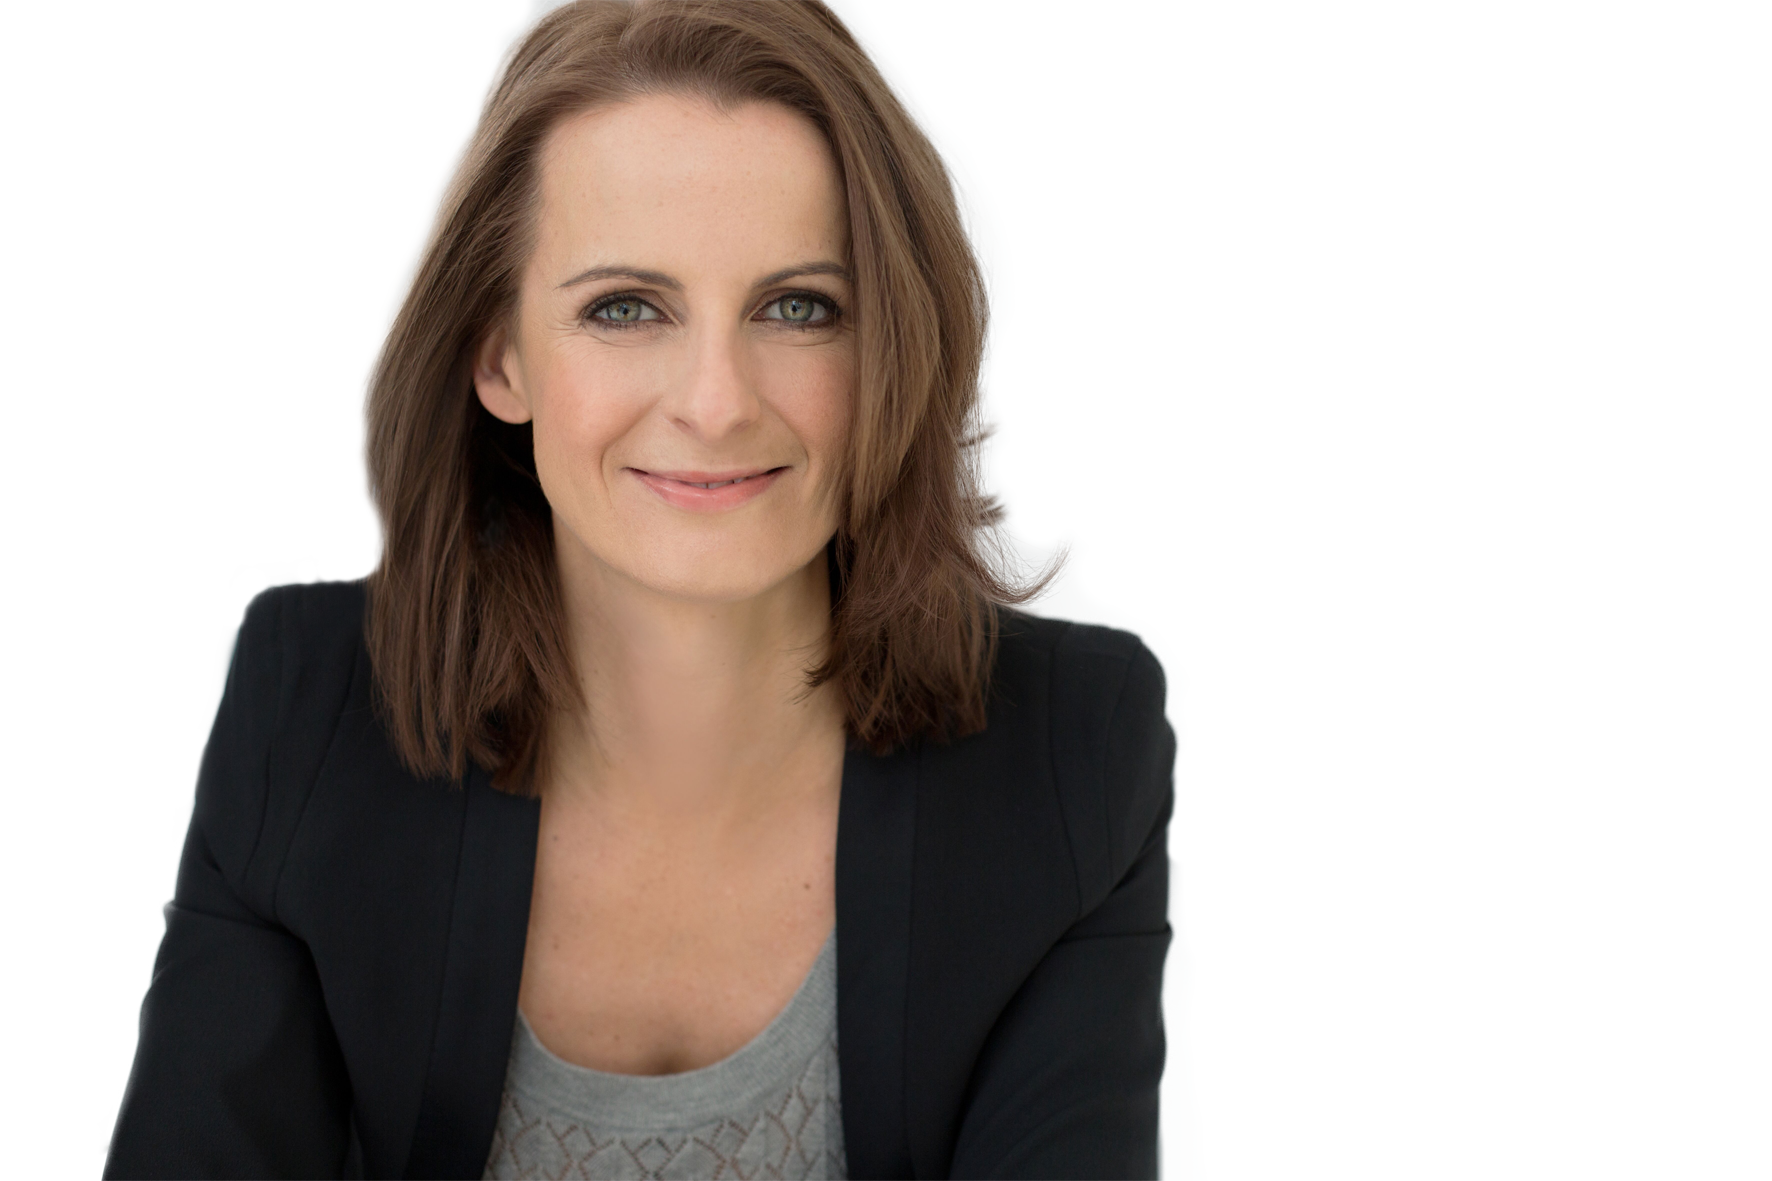 Dr. Simone Weissenbach